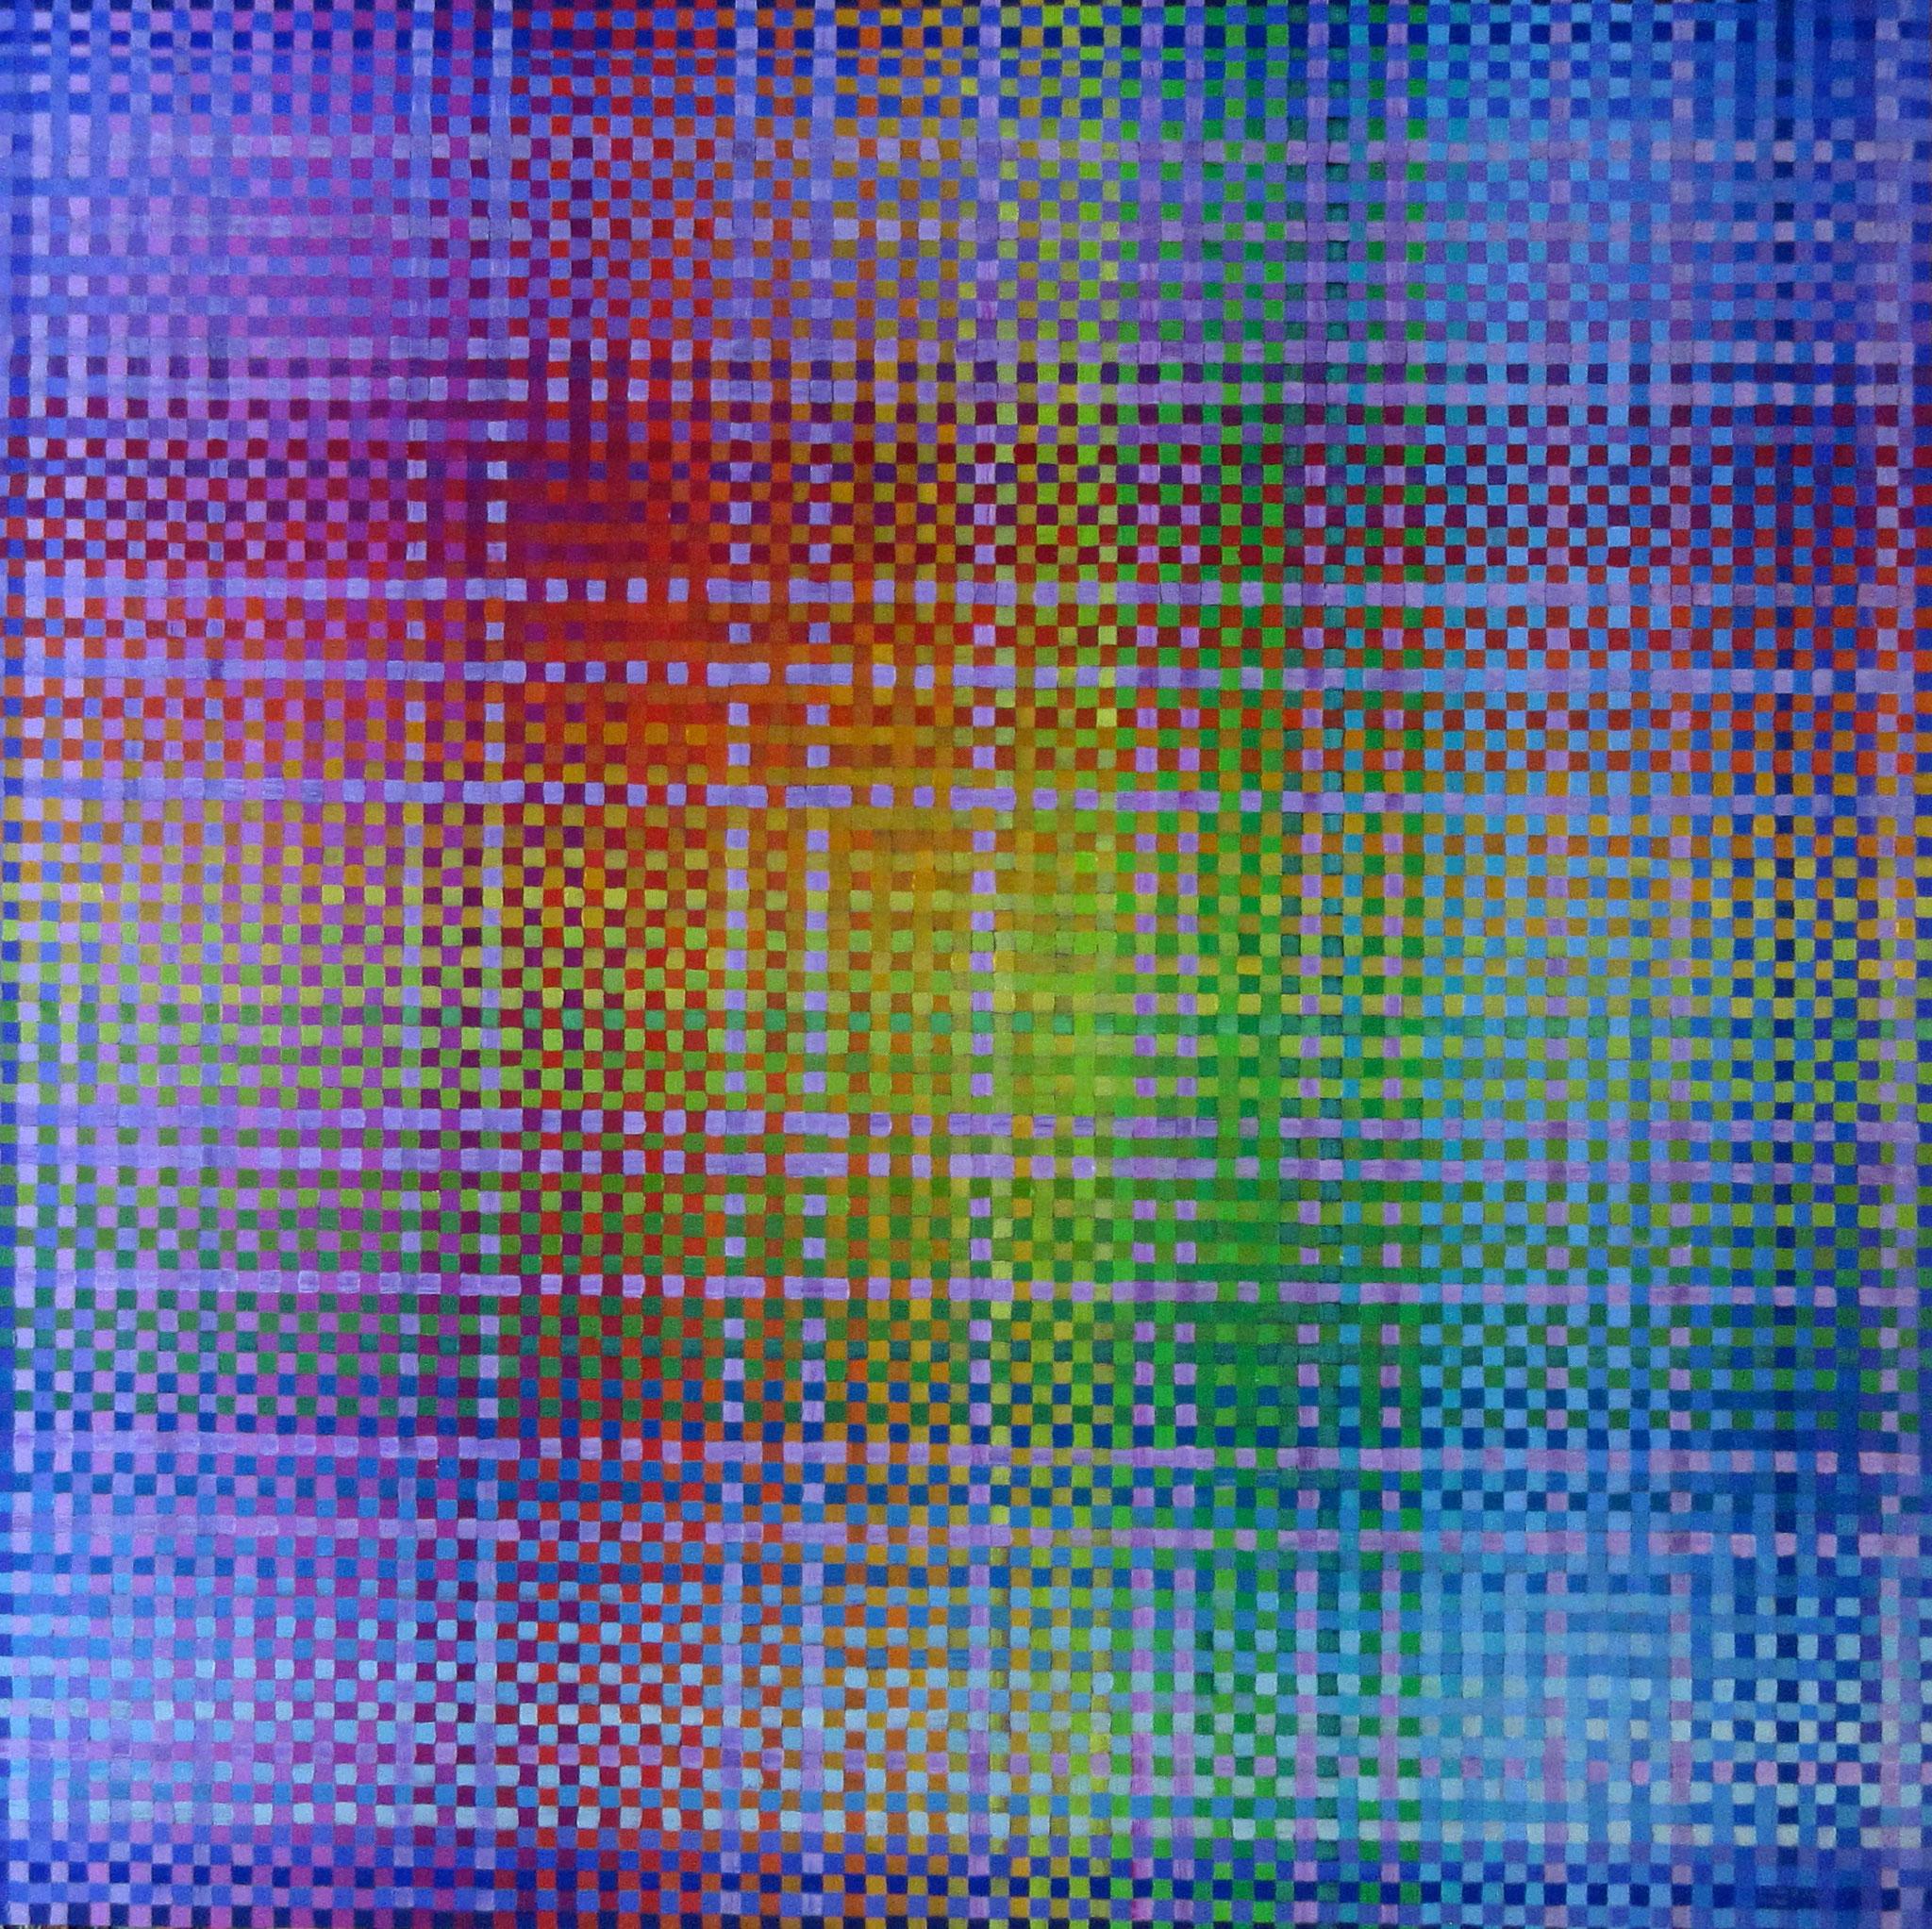 Plaid IV, oil on canvas 48x48, Dec.2016